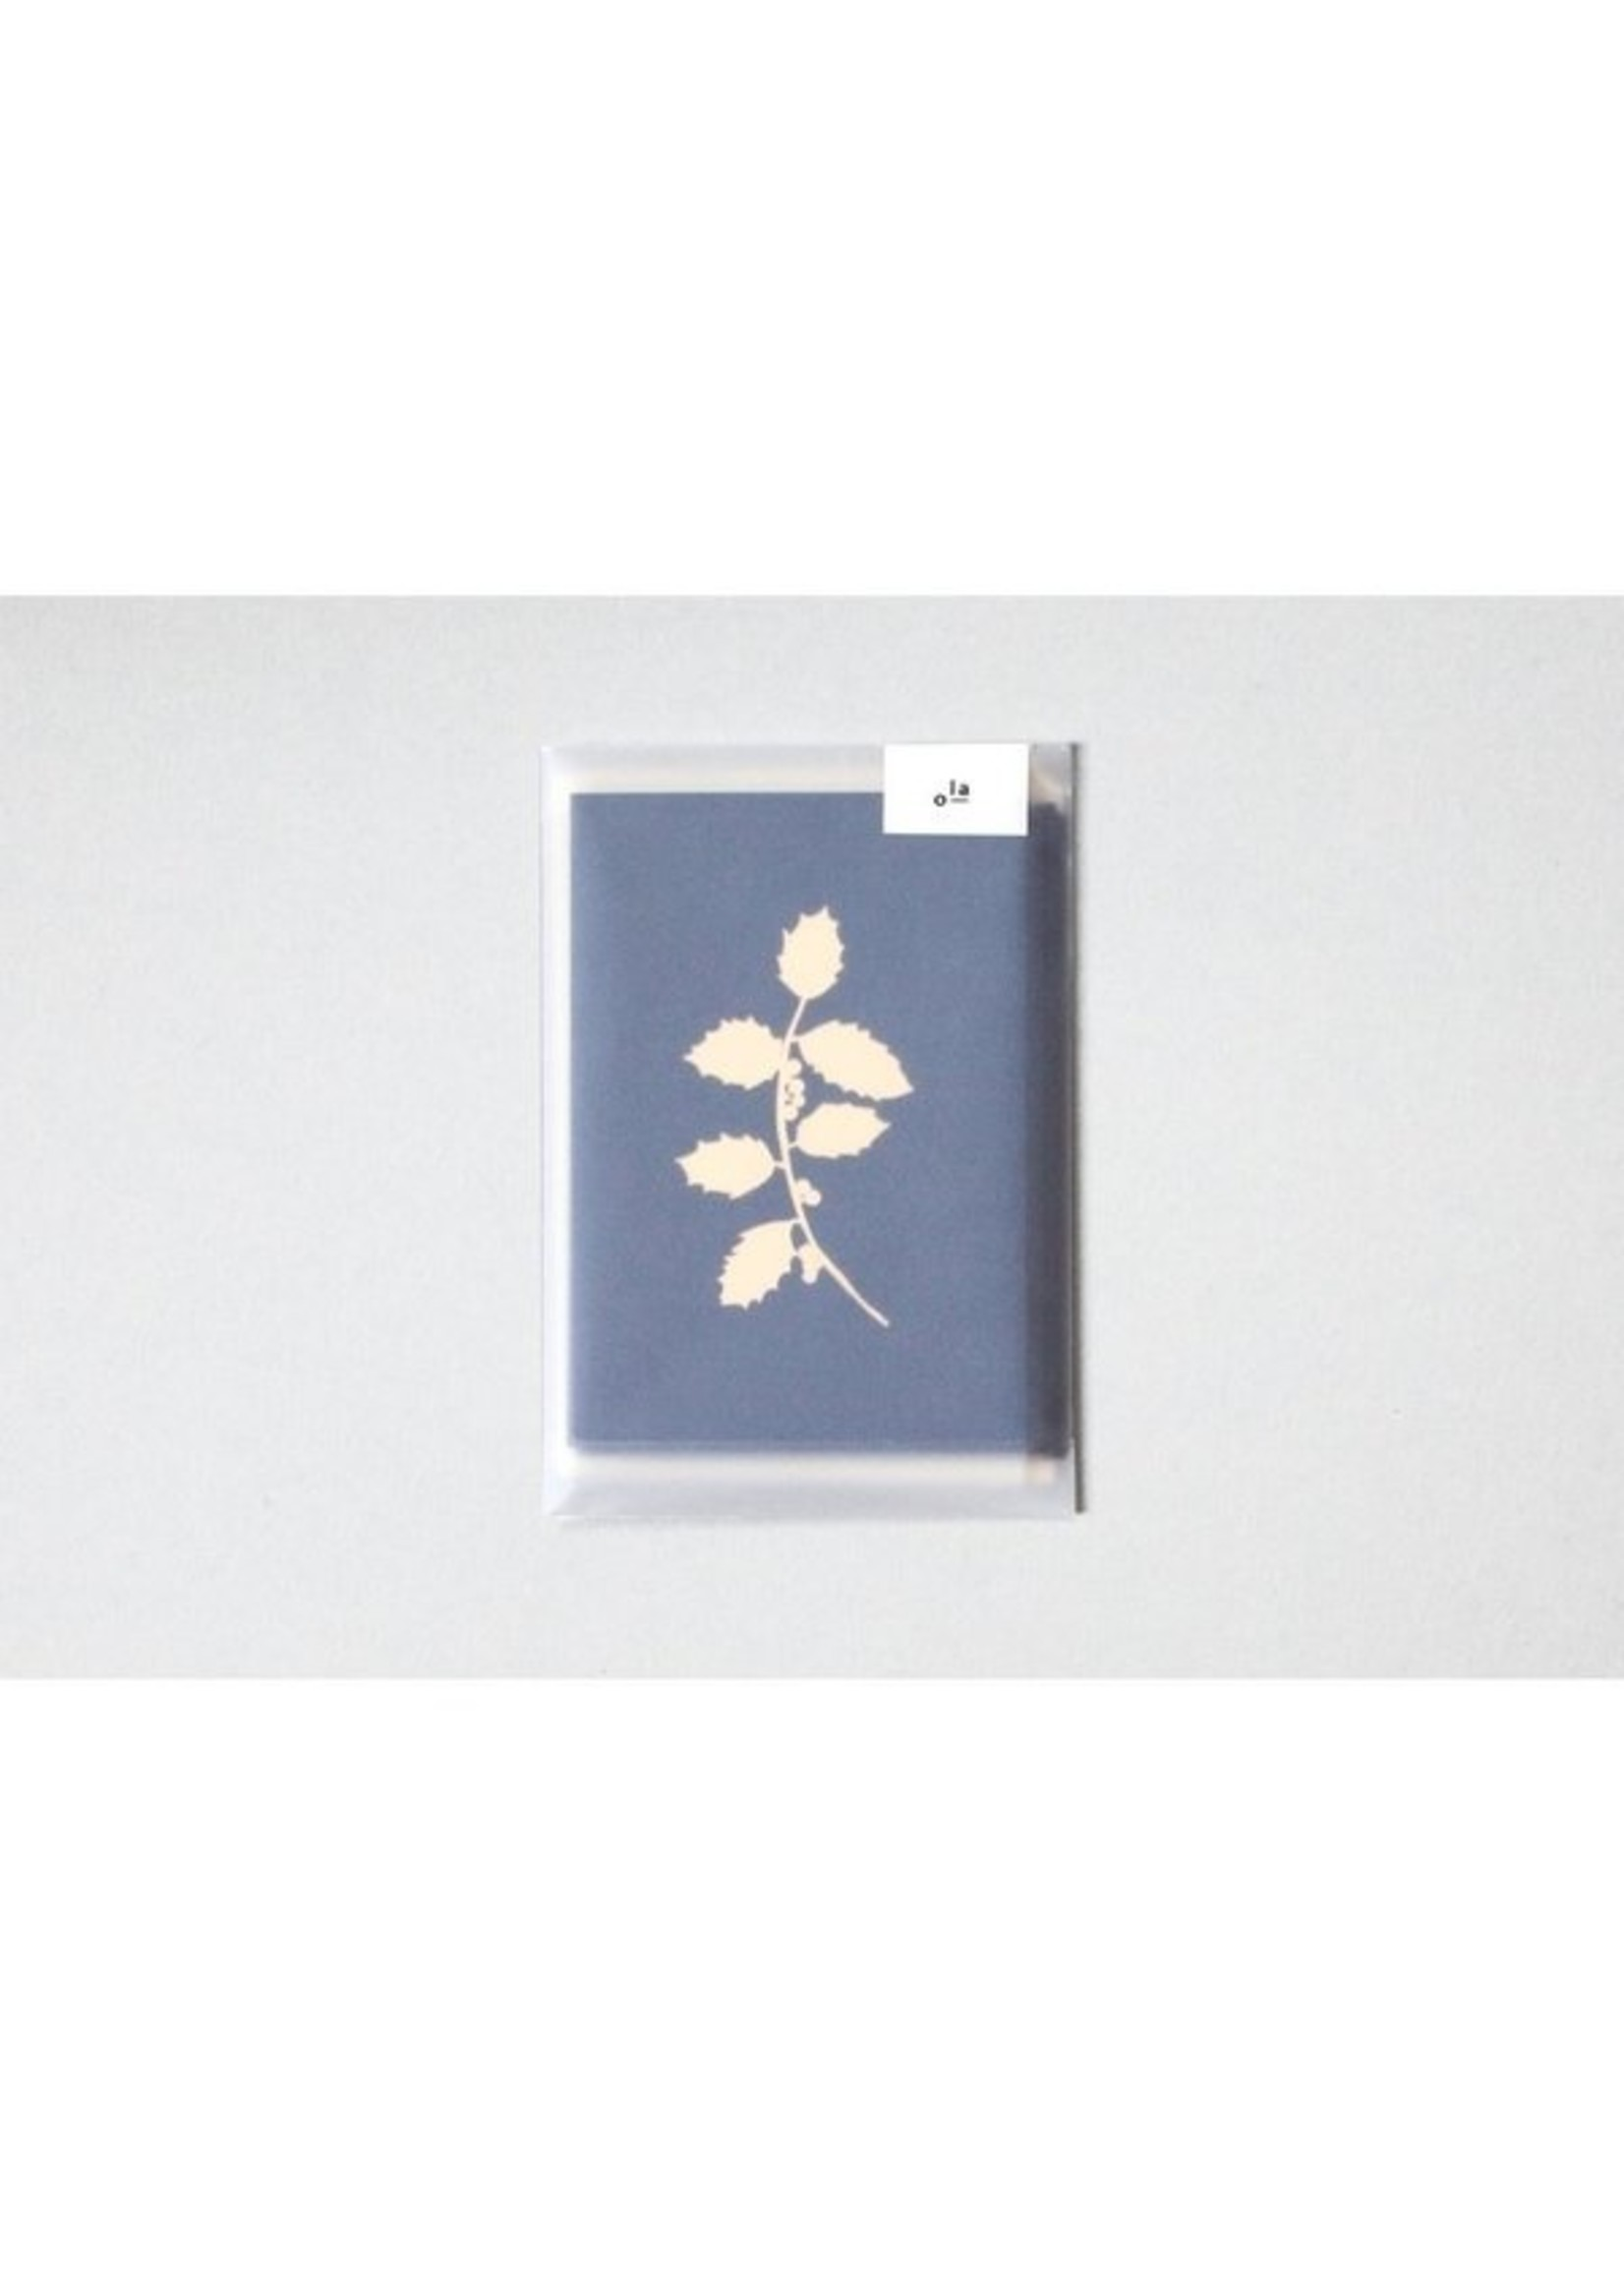 Ola Ola Foil Blocked Cards: Holly Print Pack of 6